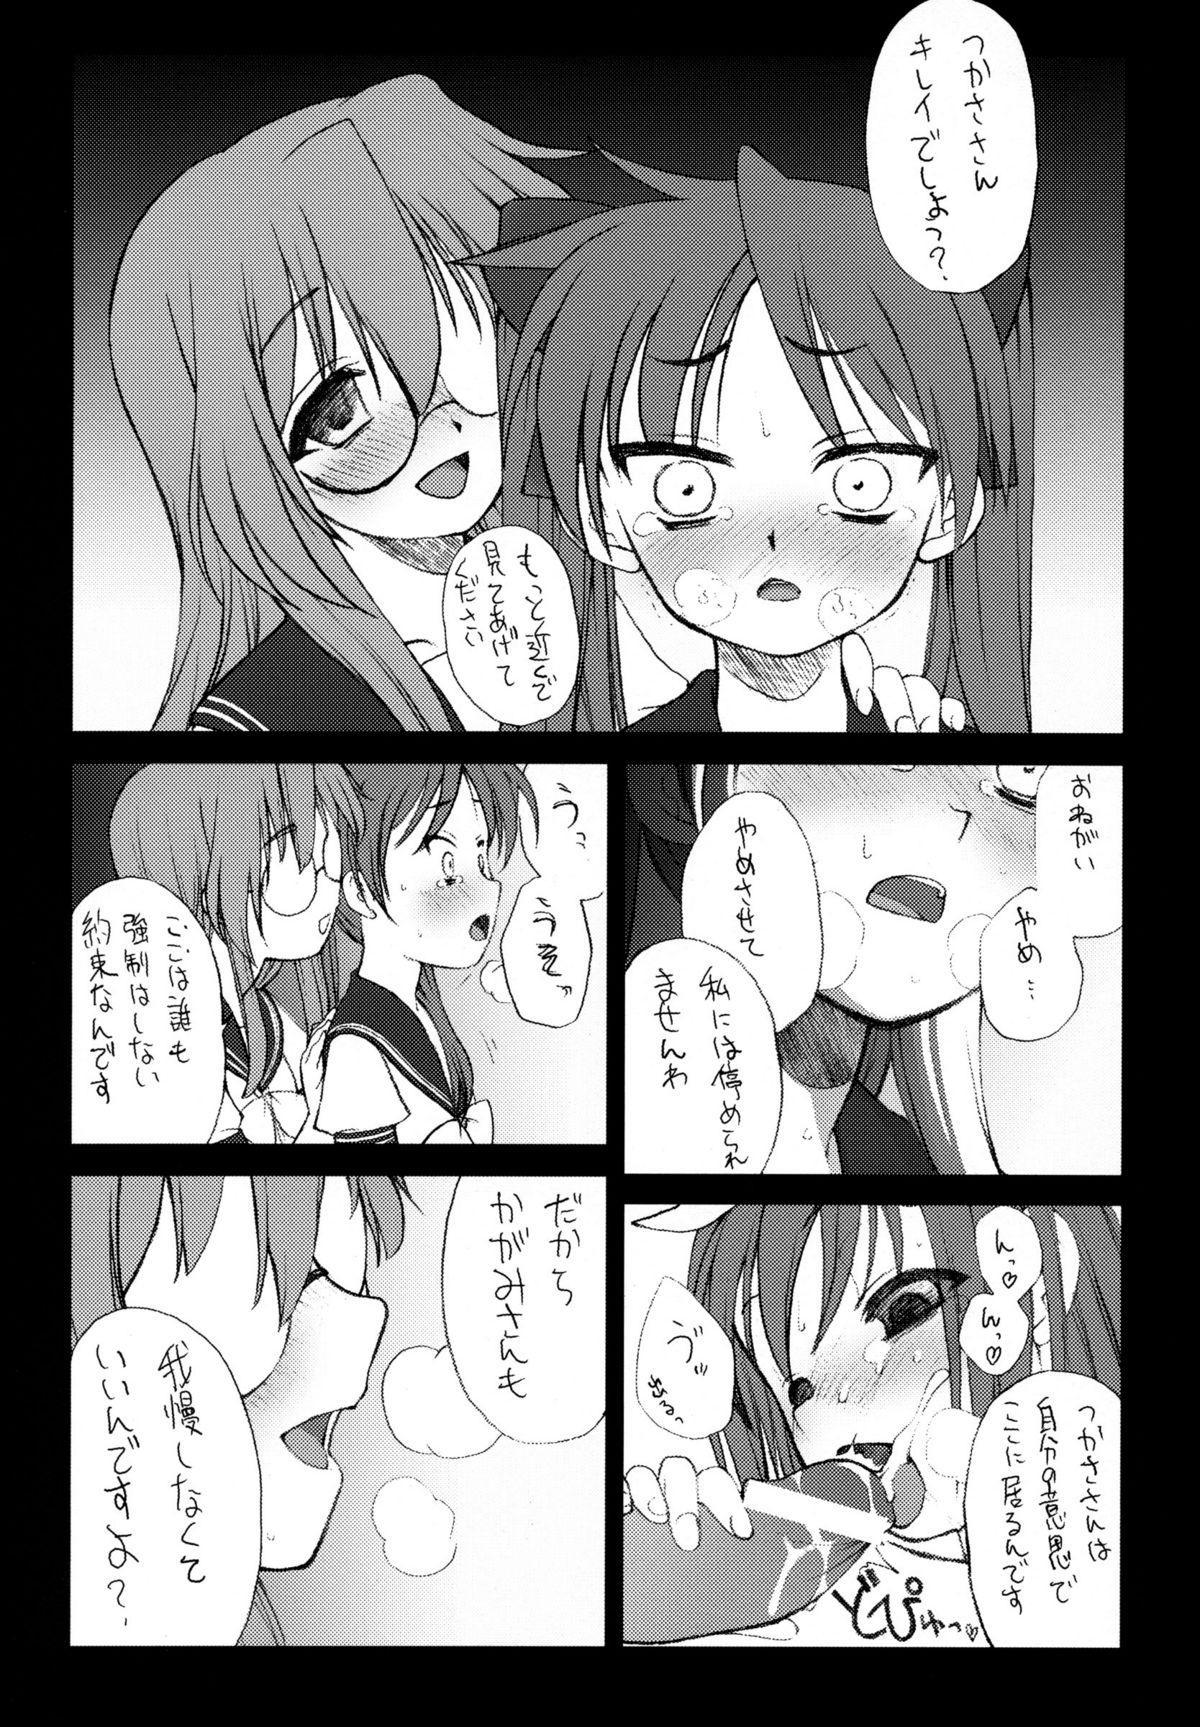 JEWELBOX DECADENT-GRAY Kyuukyousha no Toilet Kagami Tsukasa no Ecchi na Hon 12